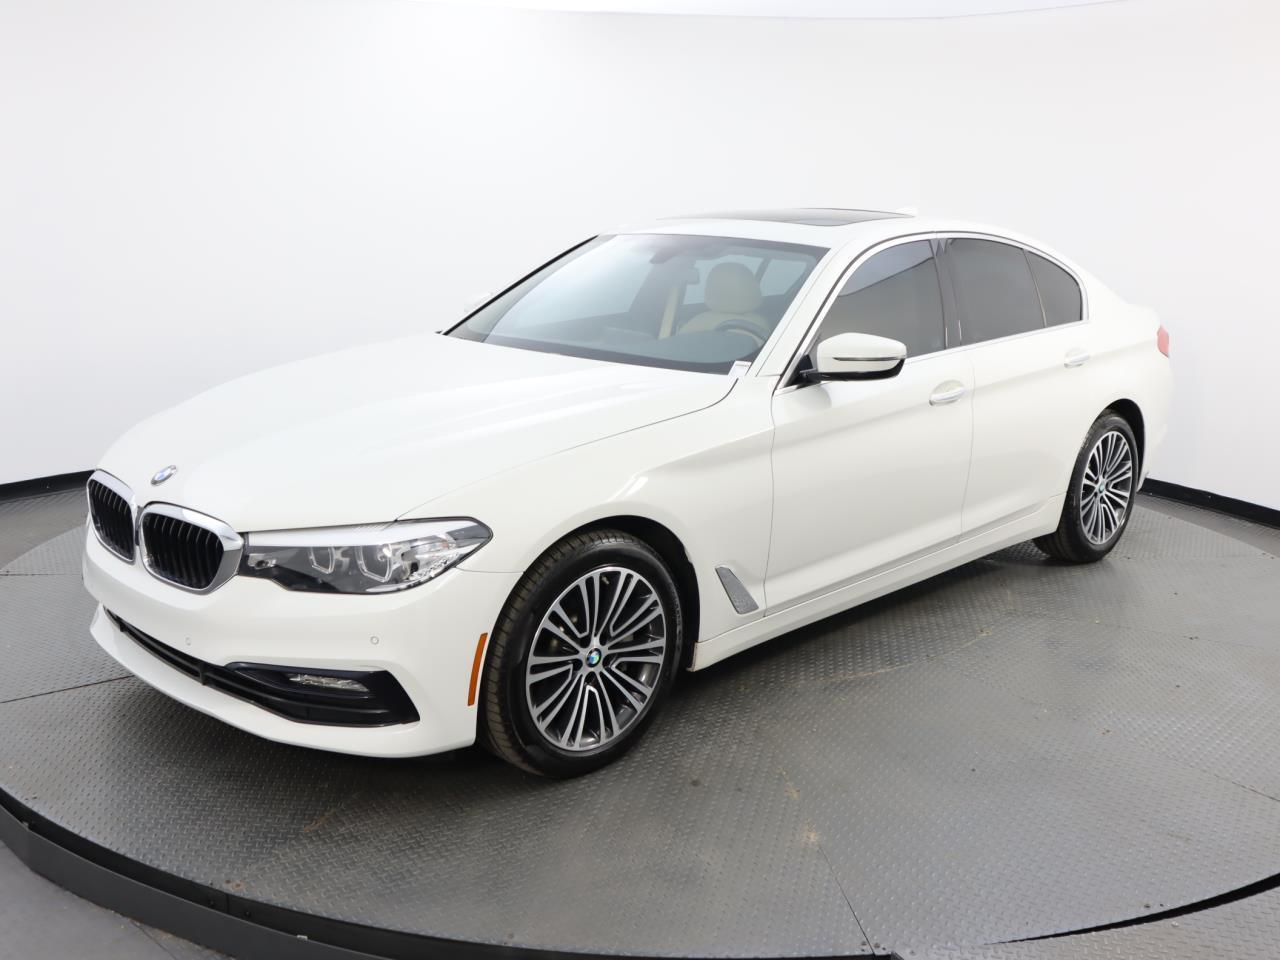 Used BMW 5-SERIES 2018 MIAMI 530I